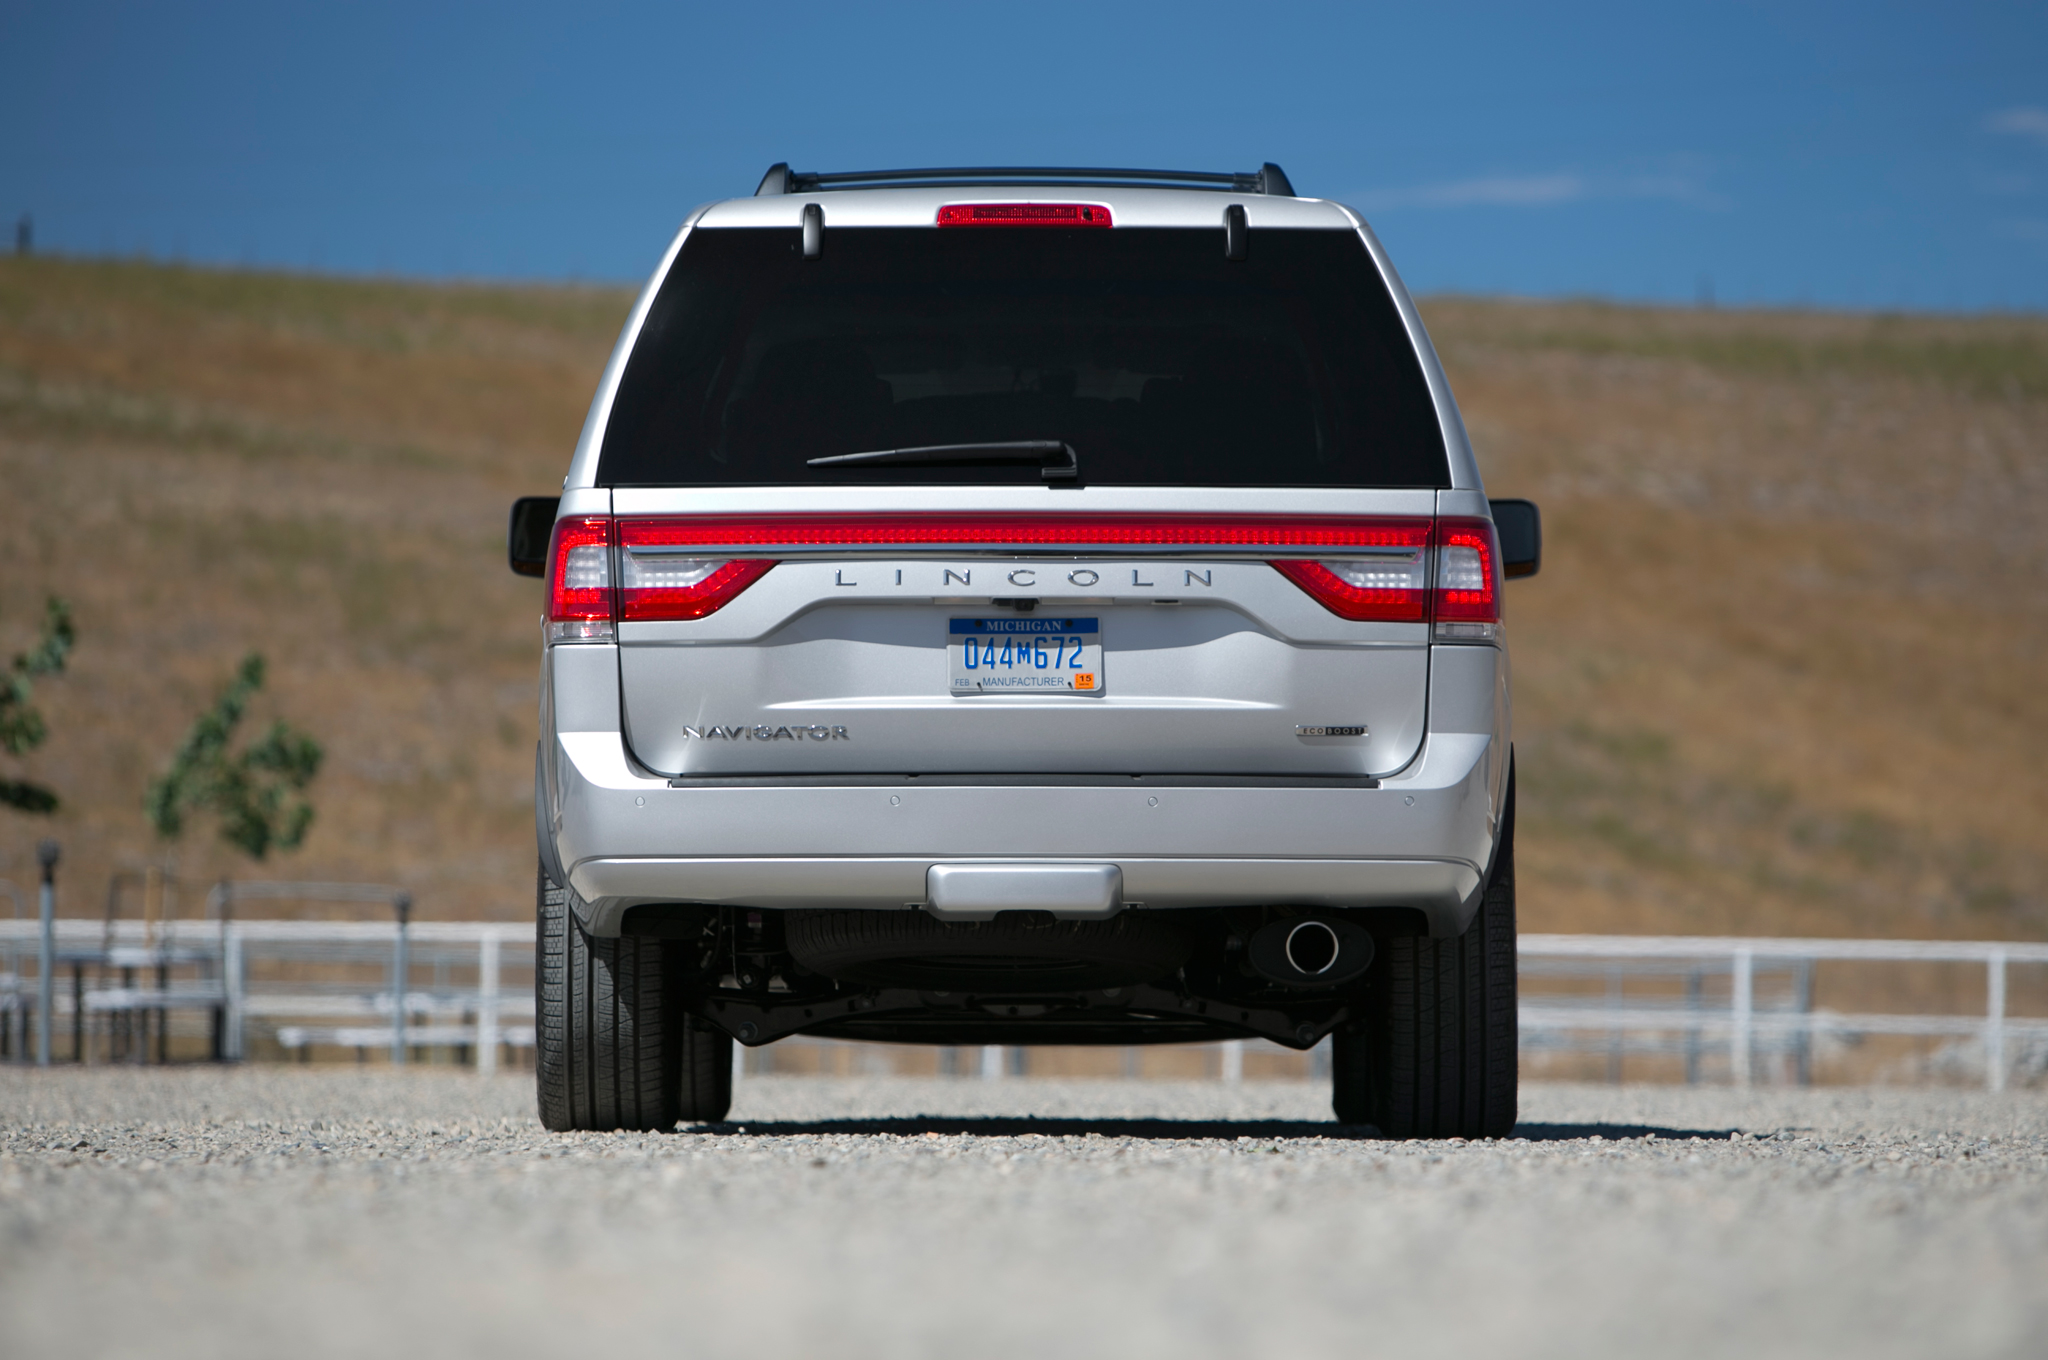 2015 Lincoln Navigator Rear Design